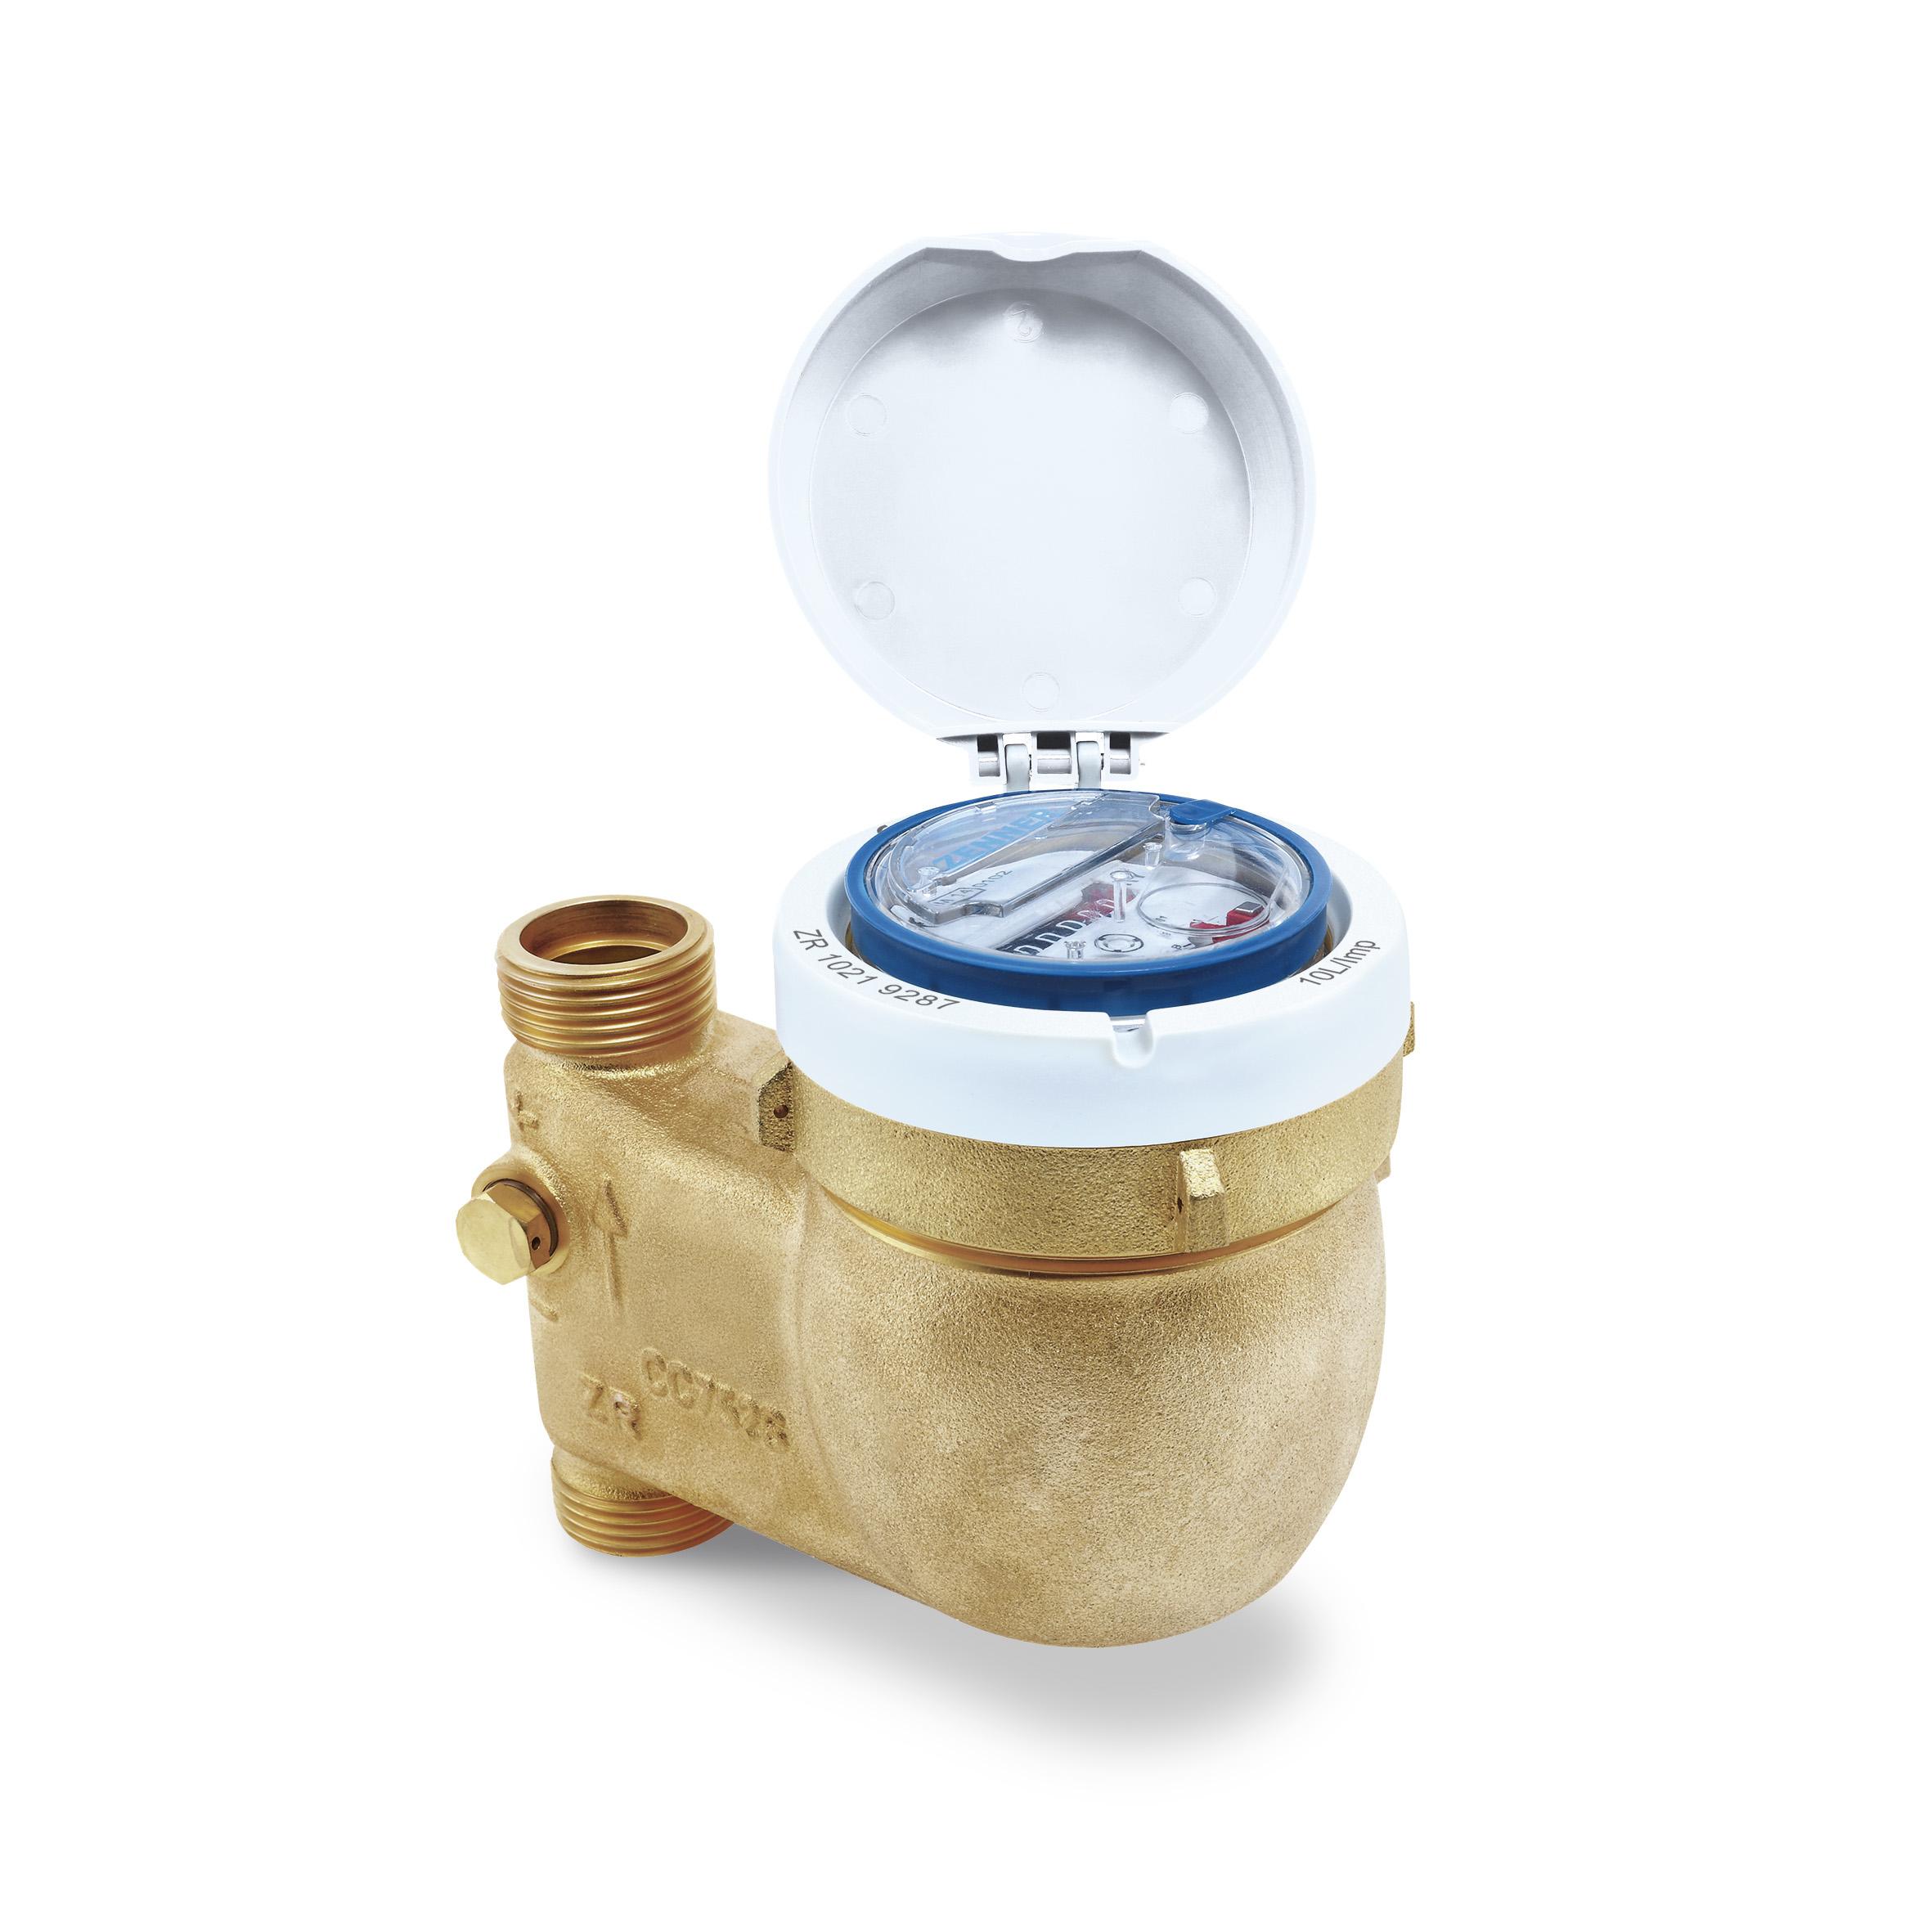 Water meter MTKD-N-ST in a standpipe design